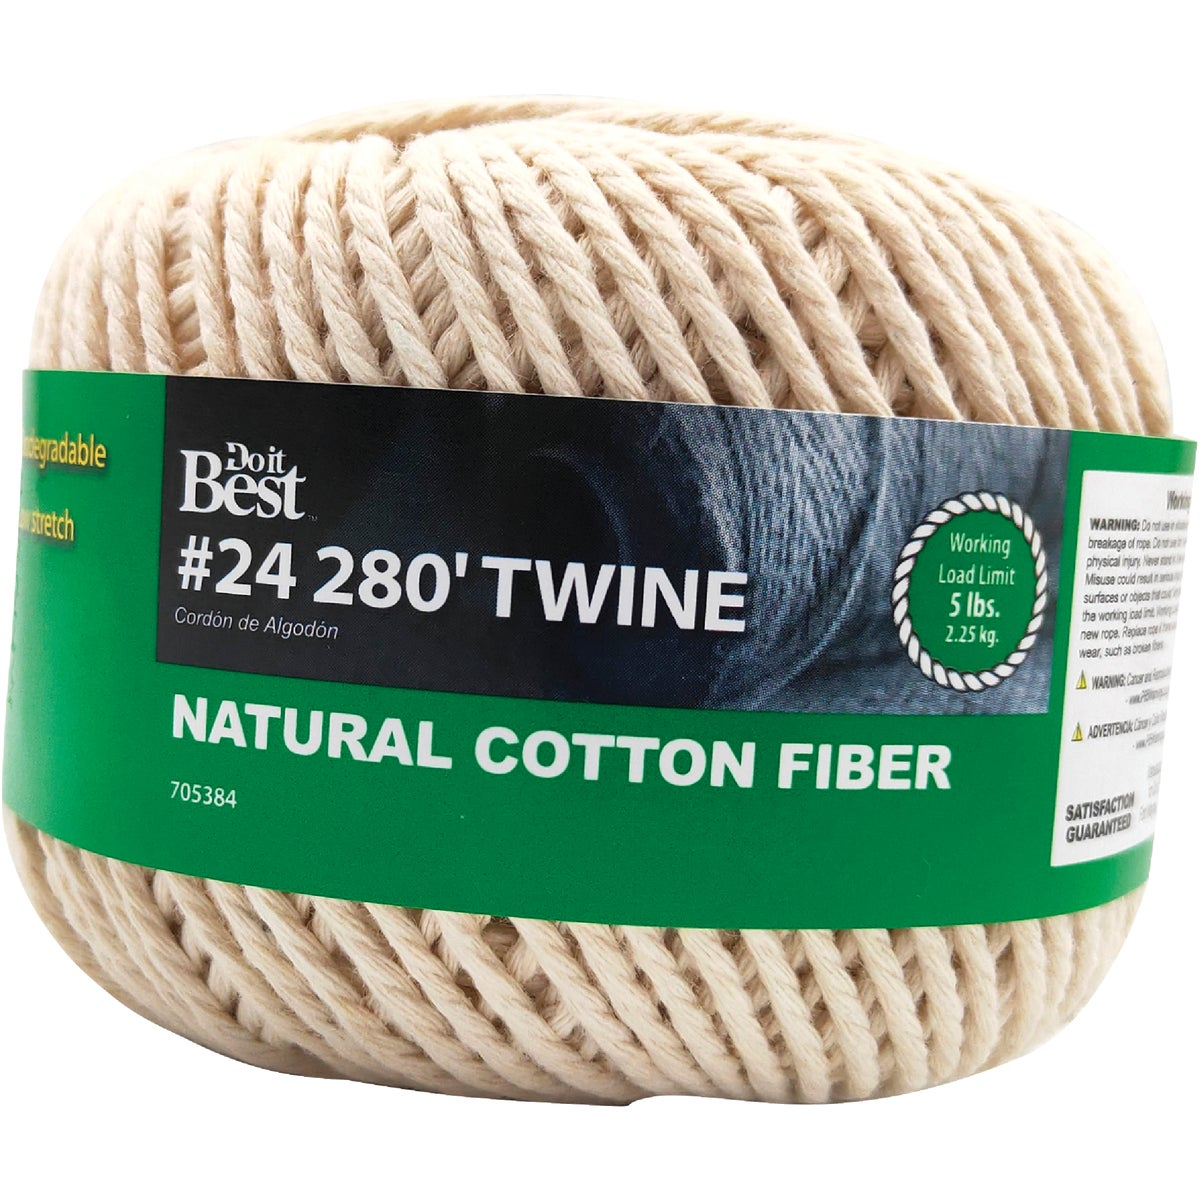 #24 280' COTTON TWINE